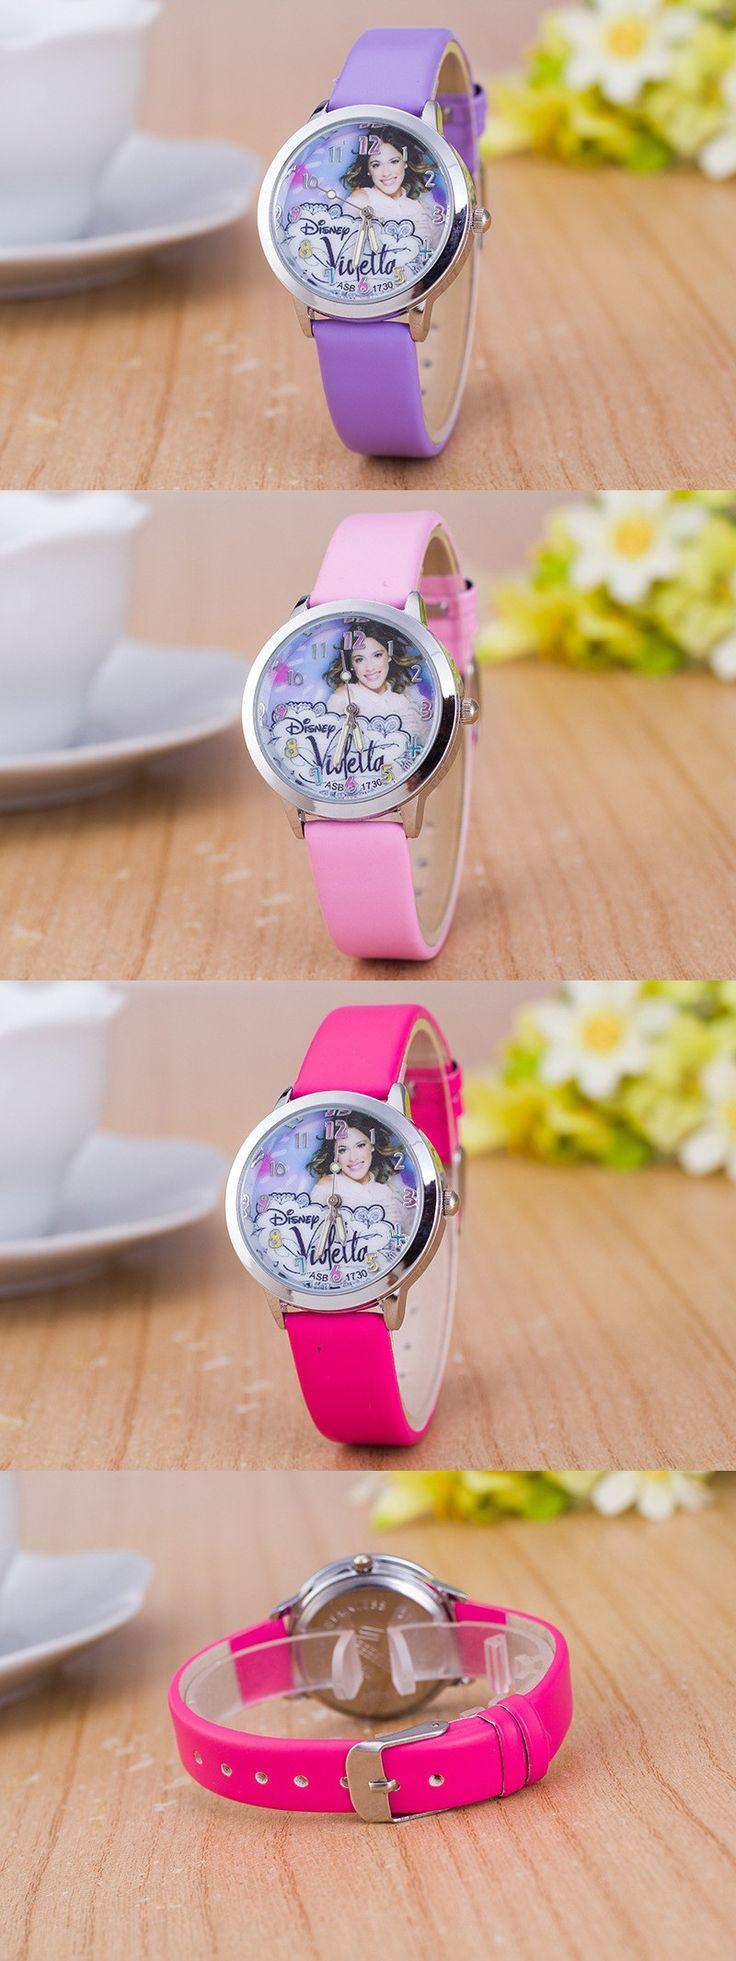 Free shipping 10pcs fashion Violetta Watches Children Kids girl Boys gift Minions Watch Casual Quartz Wristwatch Relogio Relojes